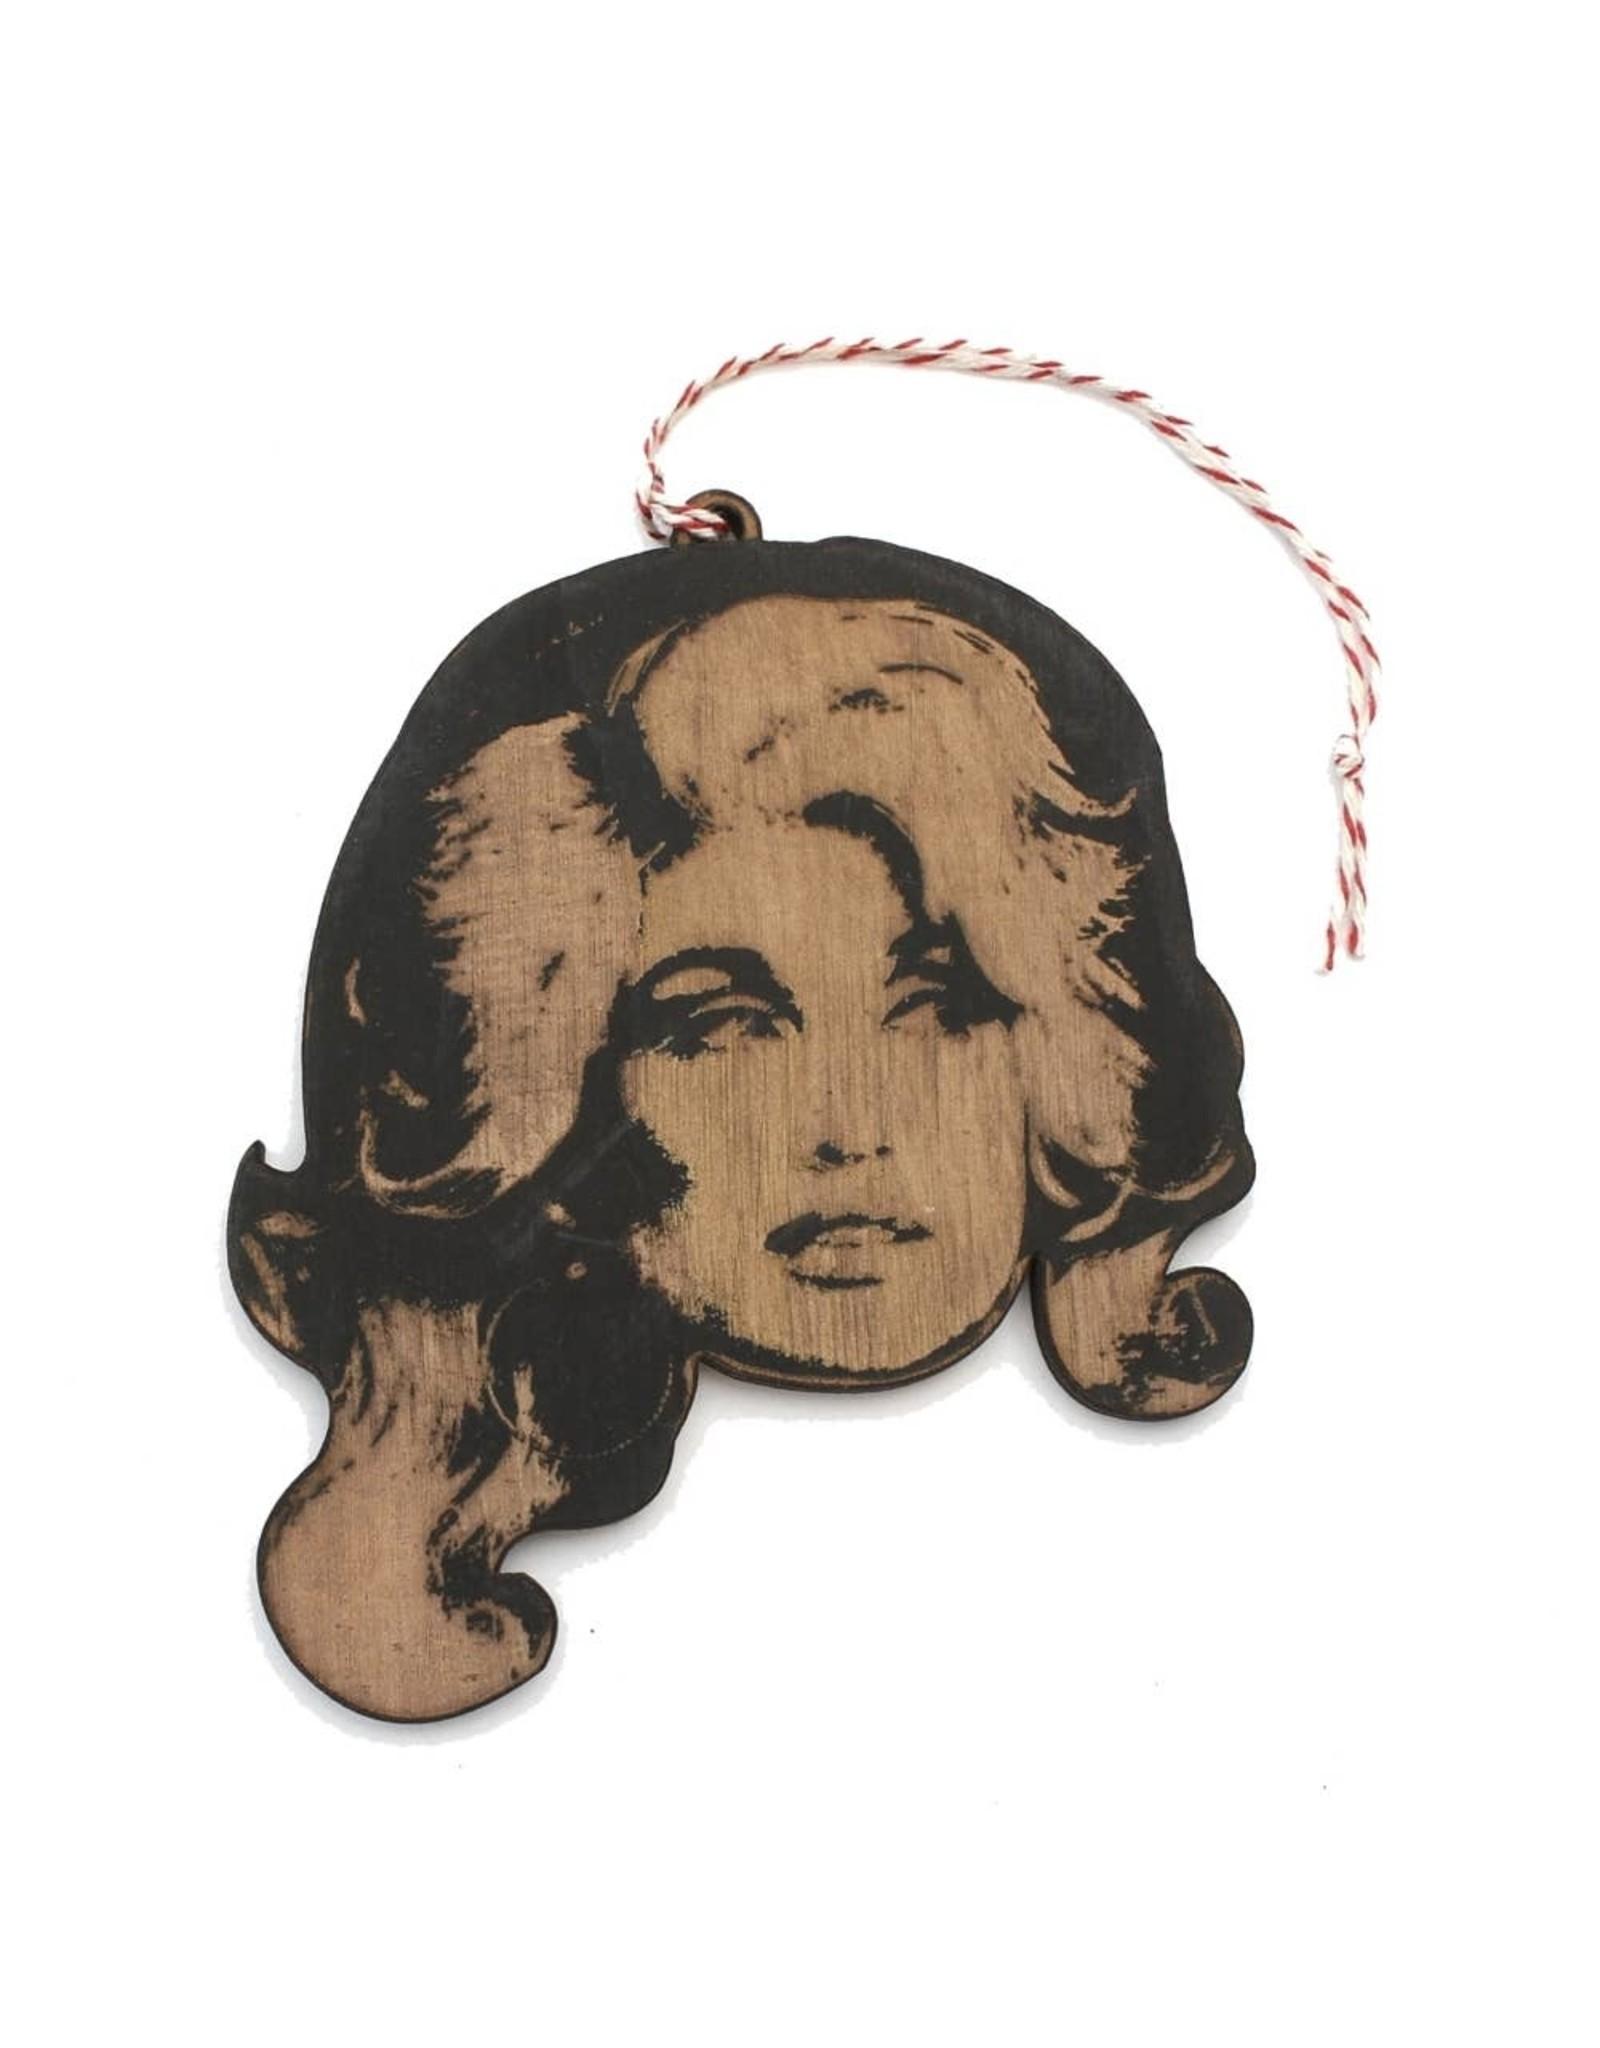 Lettercraft Ornament - Dolly Parton